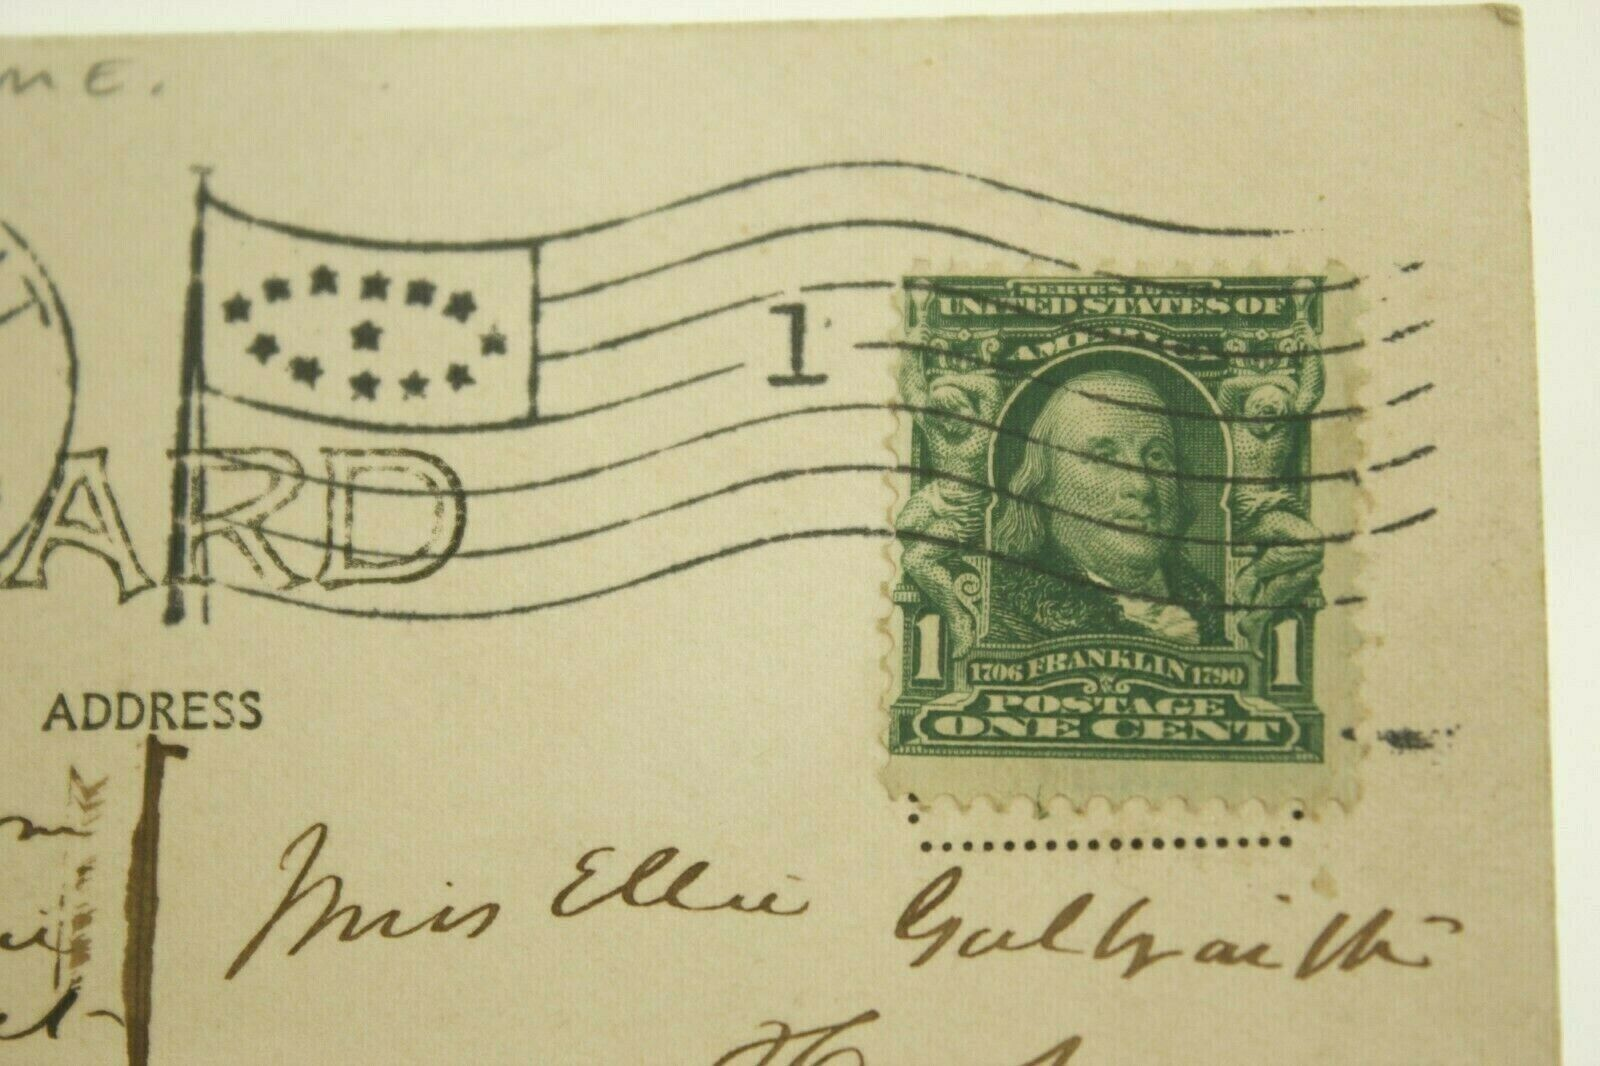 Post Stamps 1 Cent Benjamin Franklin Series 1902 Postcard, STONINGTON ME 1907 - $14.00